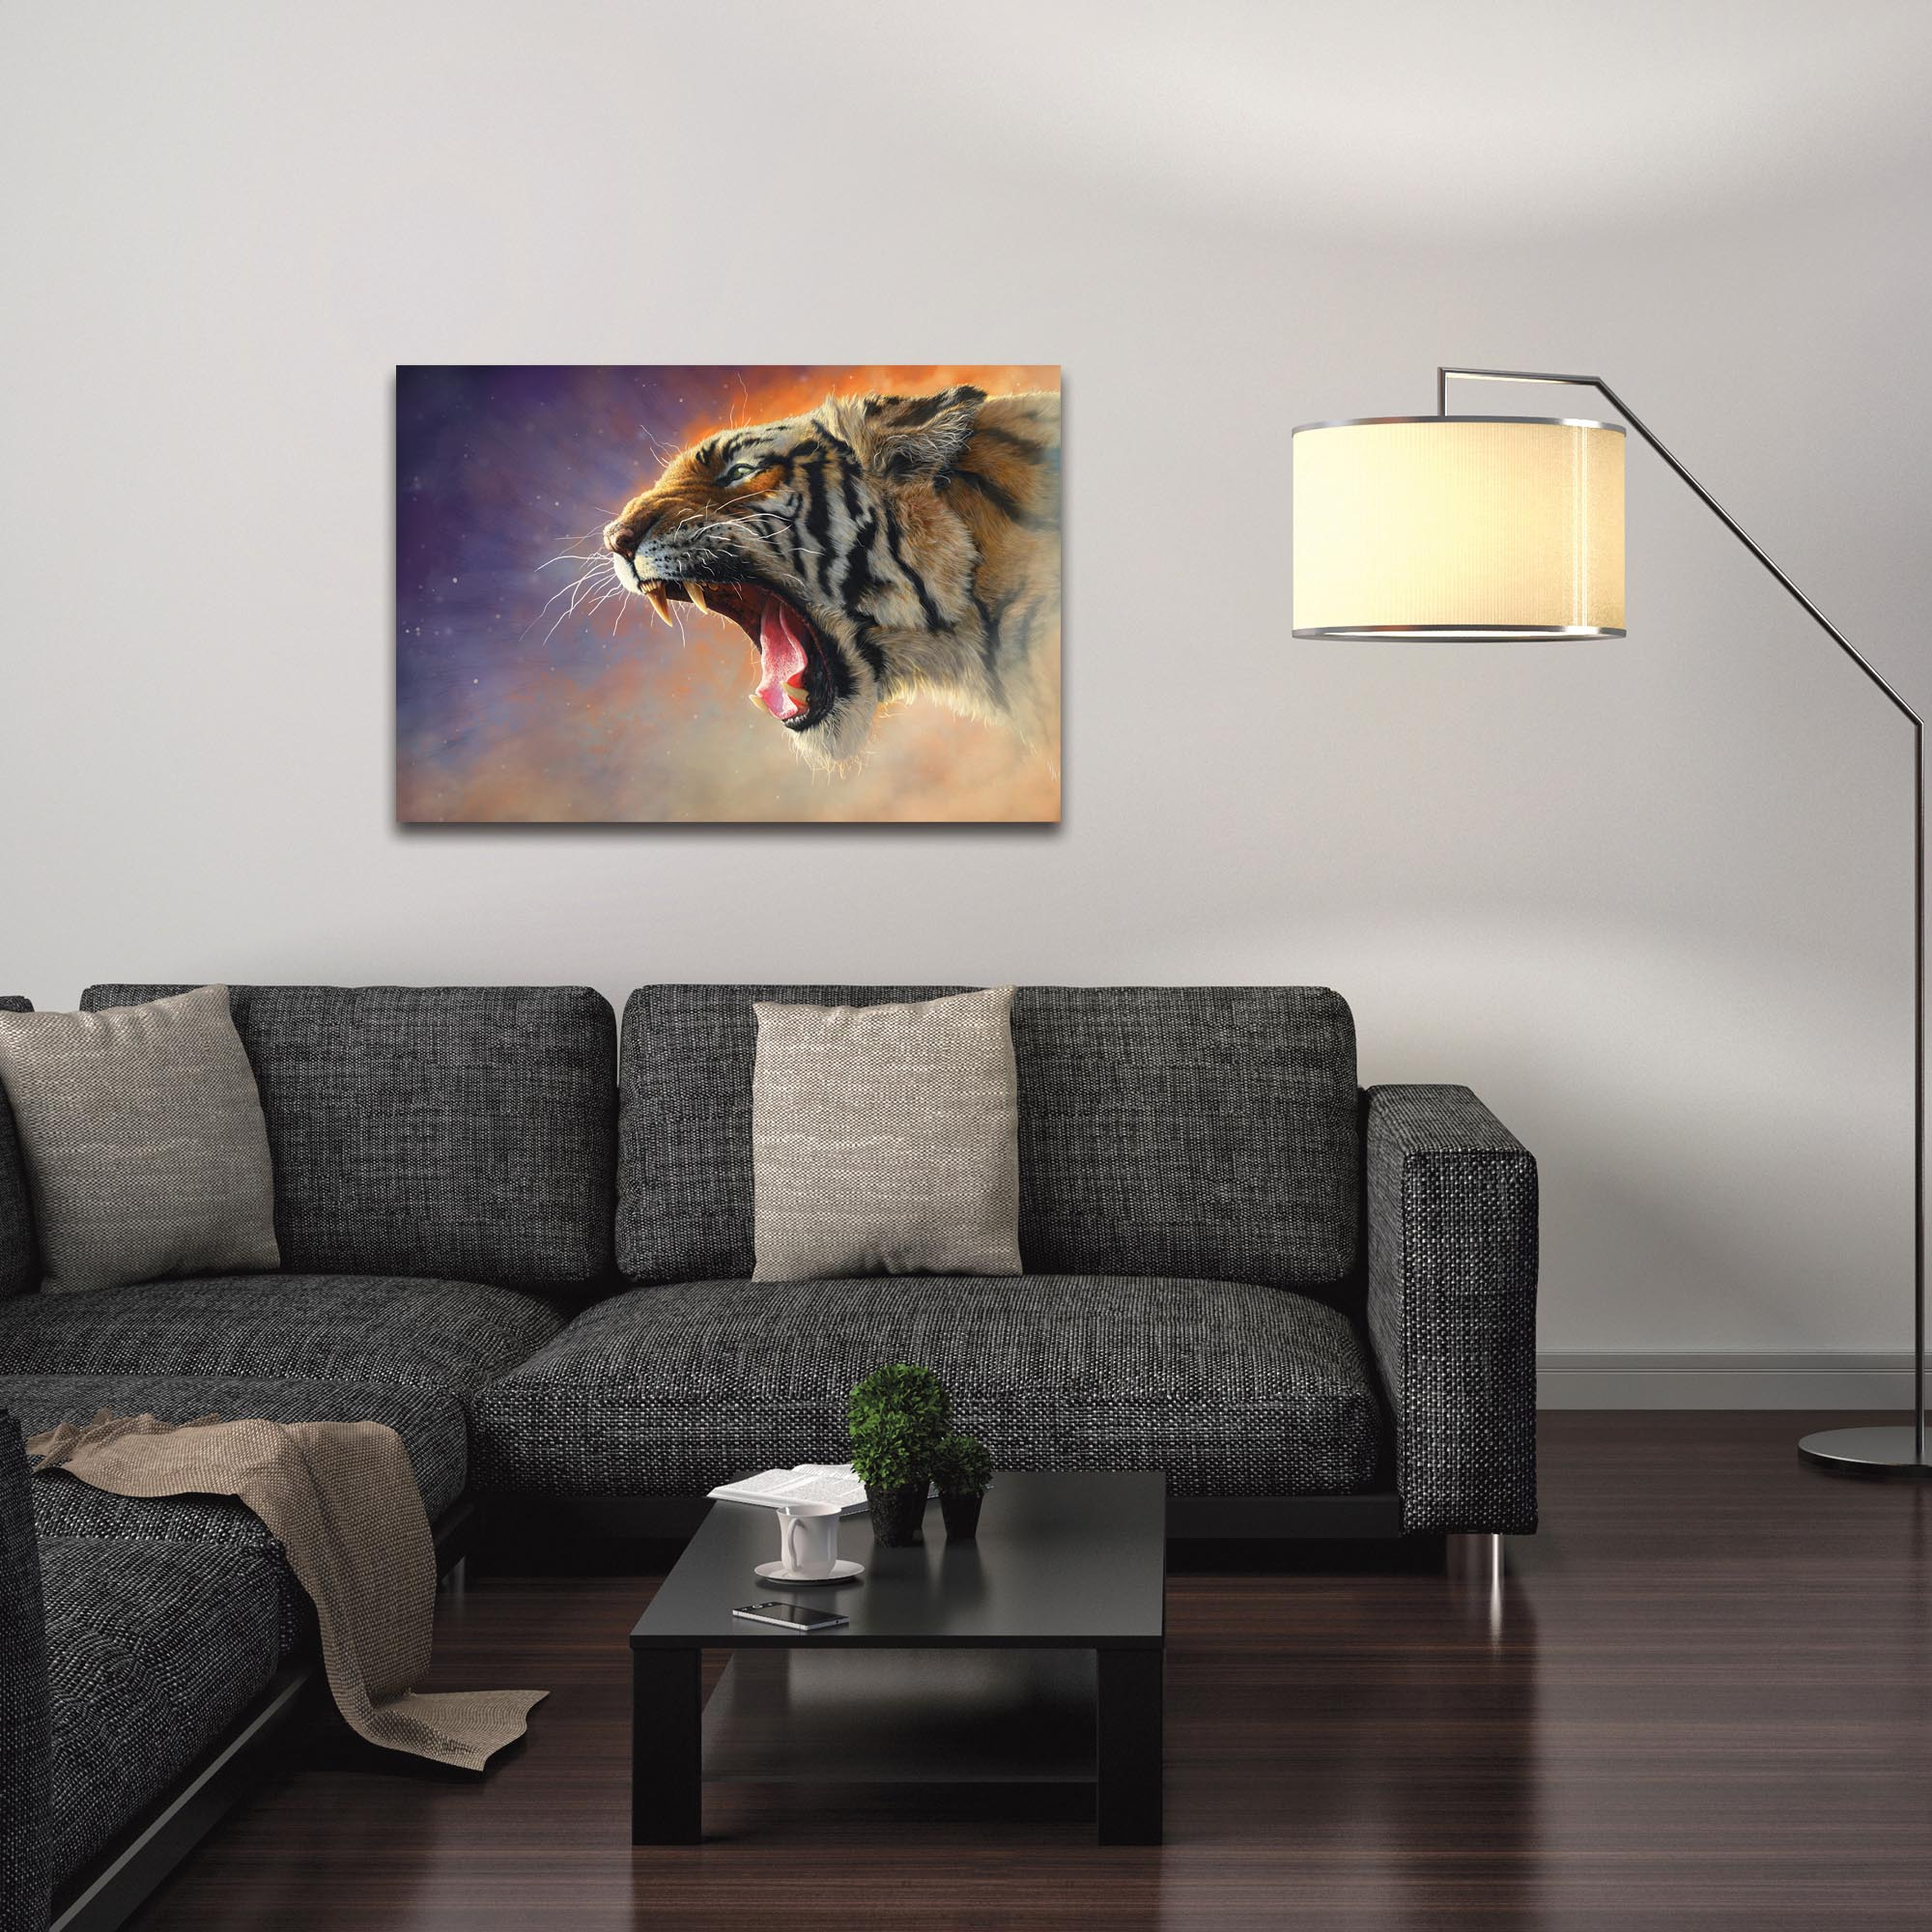 Expressionist Wall Art 'Fear Me' - Wildlife Decor on Metal or Plexiglass - Lifestyle View